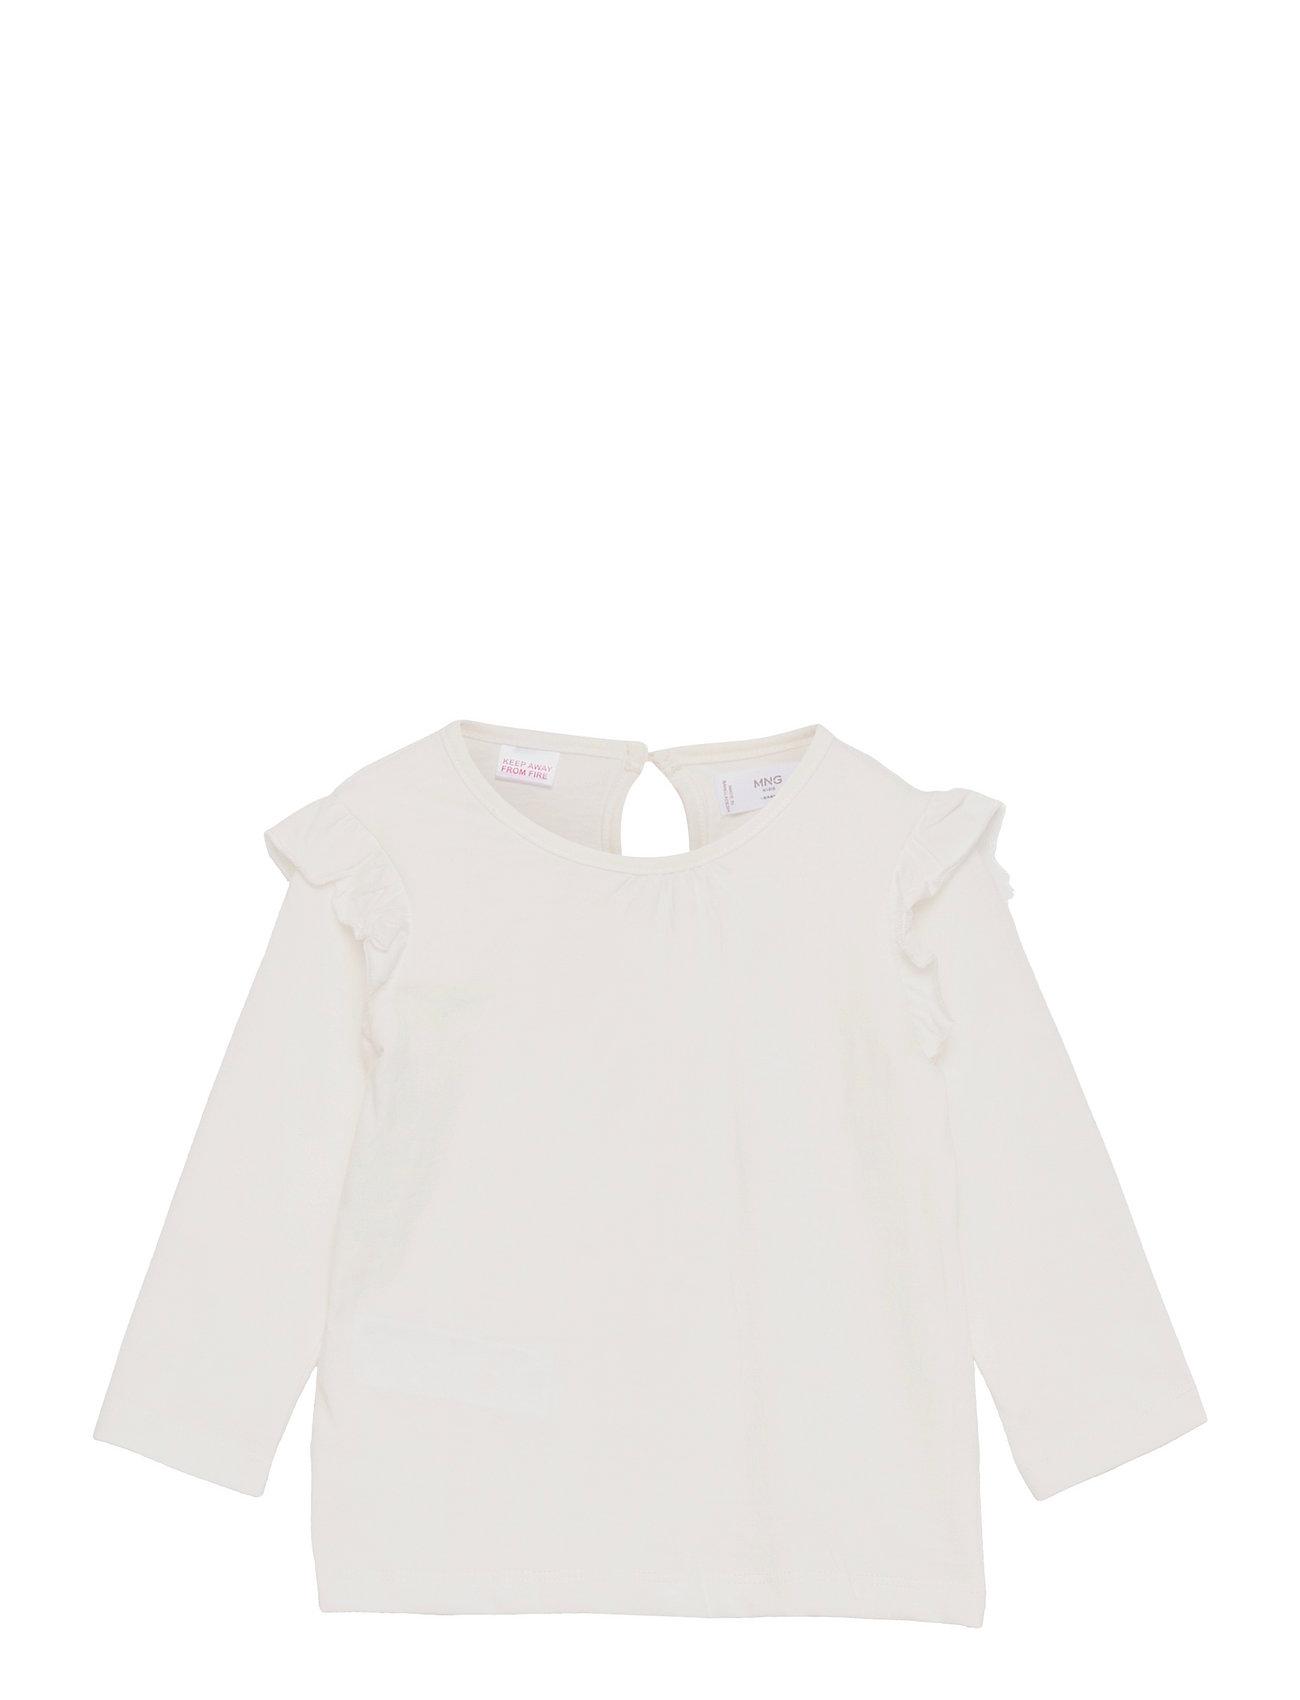 Italy Langærmet T-shirt Hvid Mango